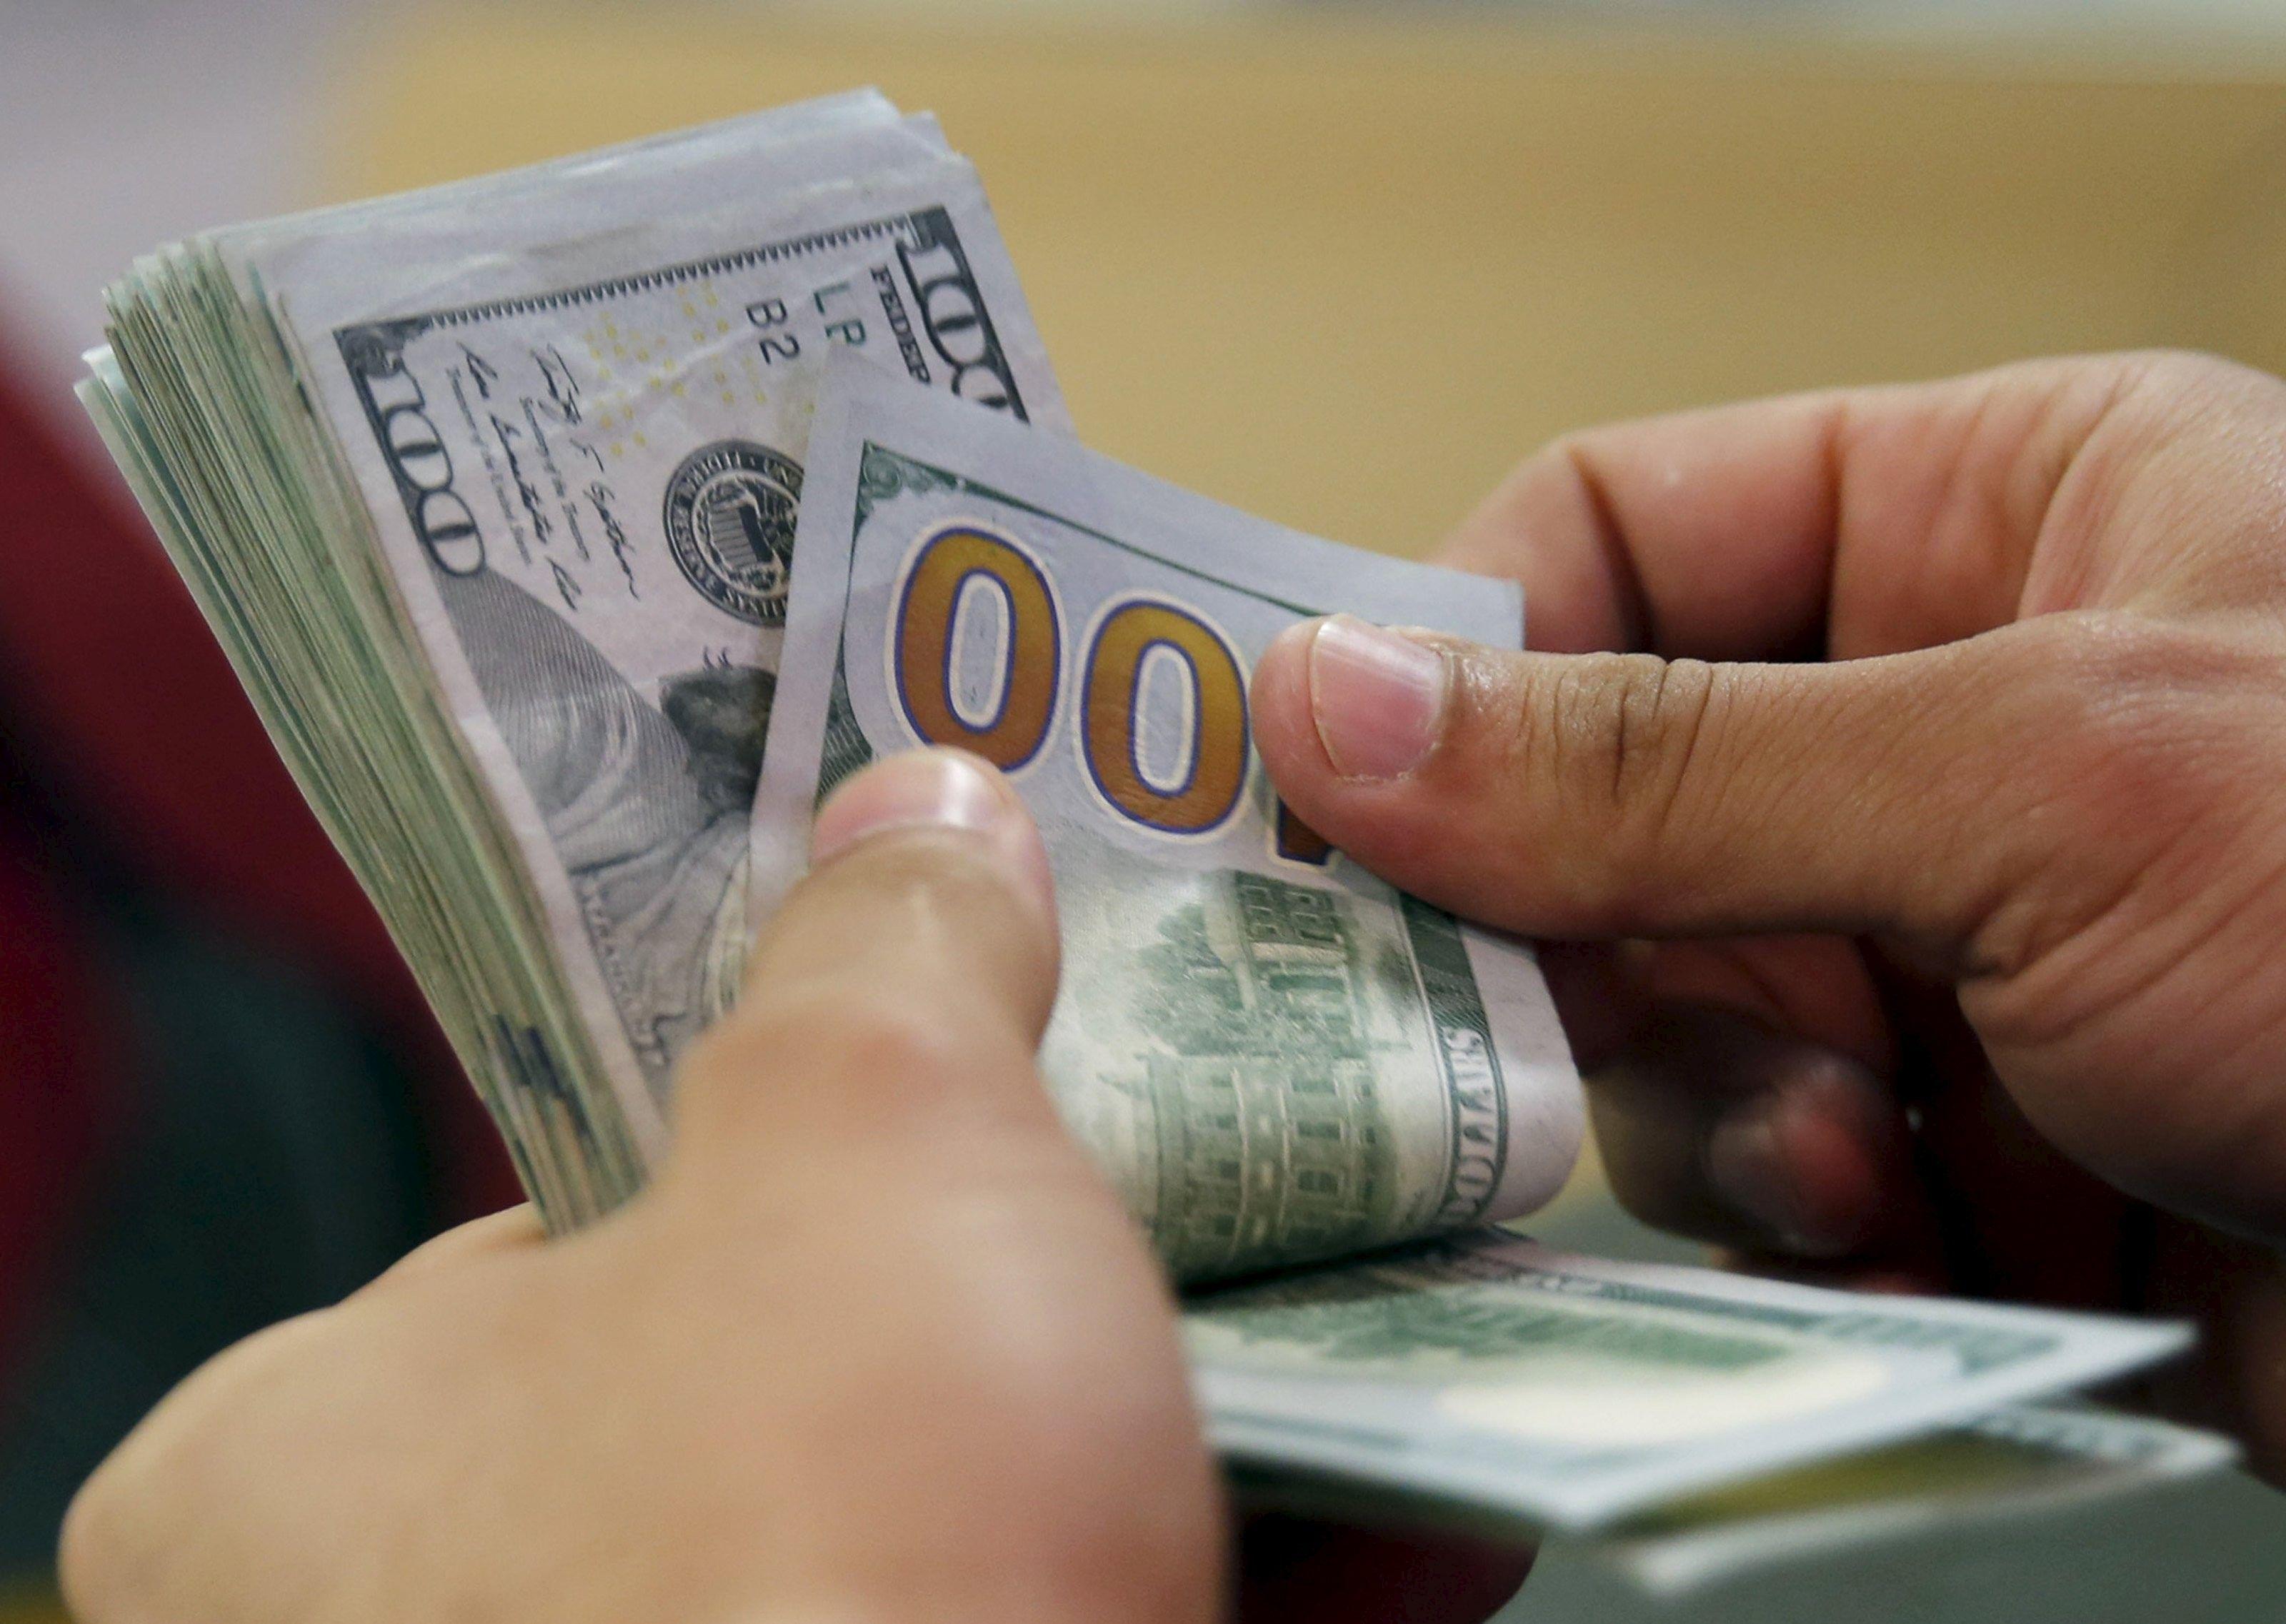 Жители Нью-Йорка получат по 100 долларов за прививку от коронавируса /  по REUTERS